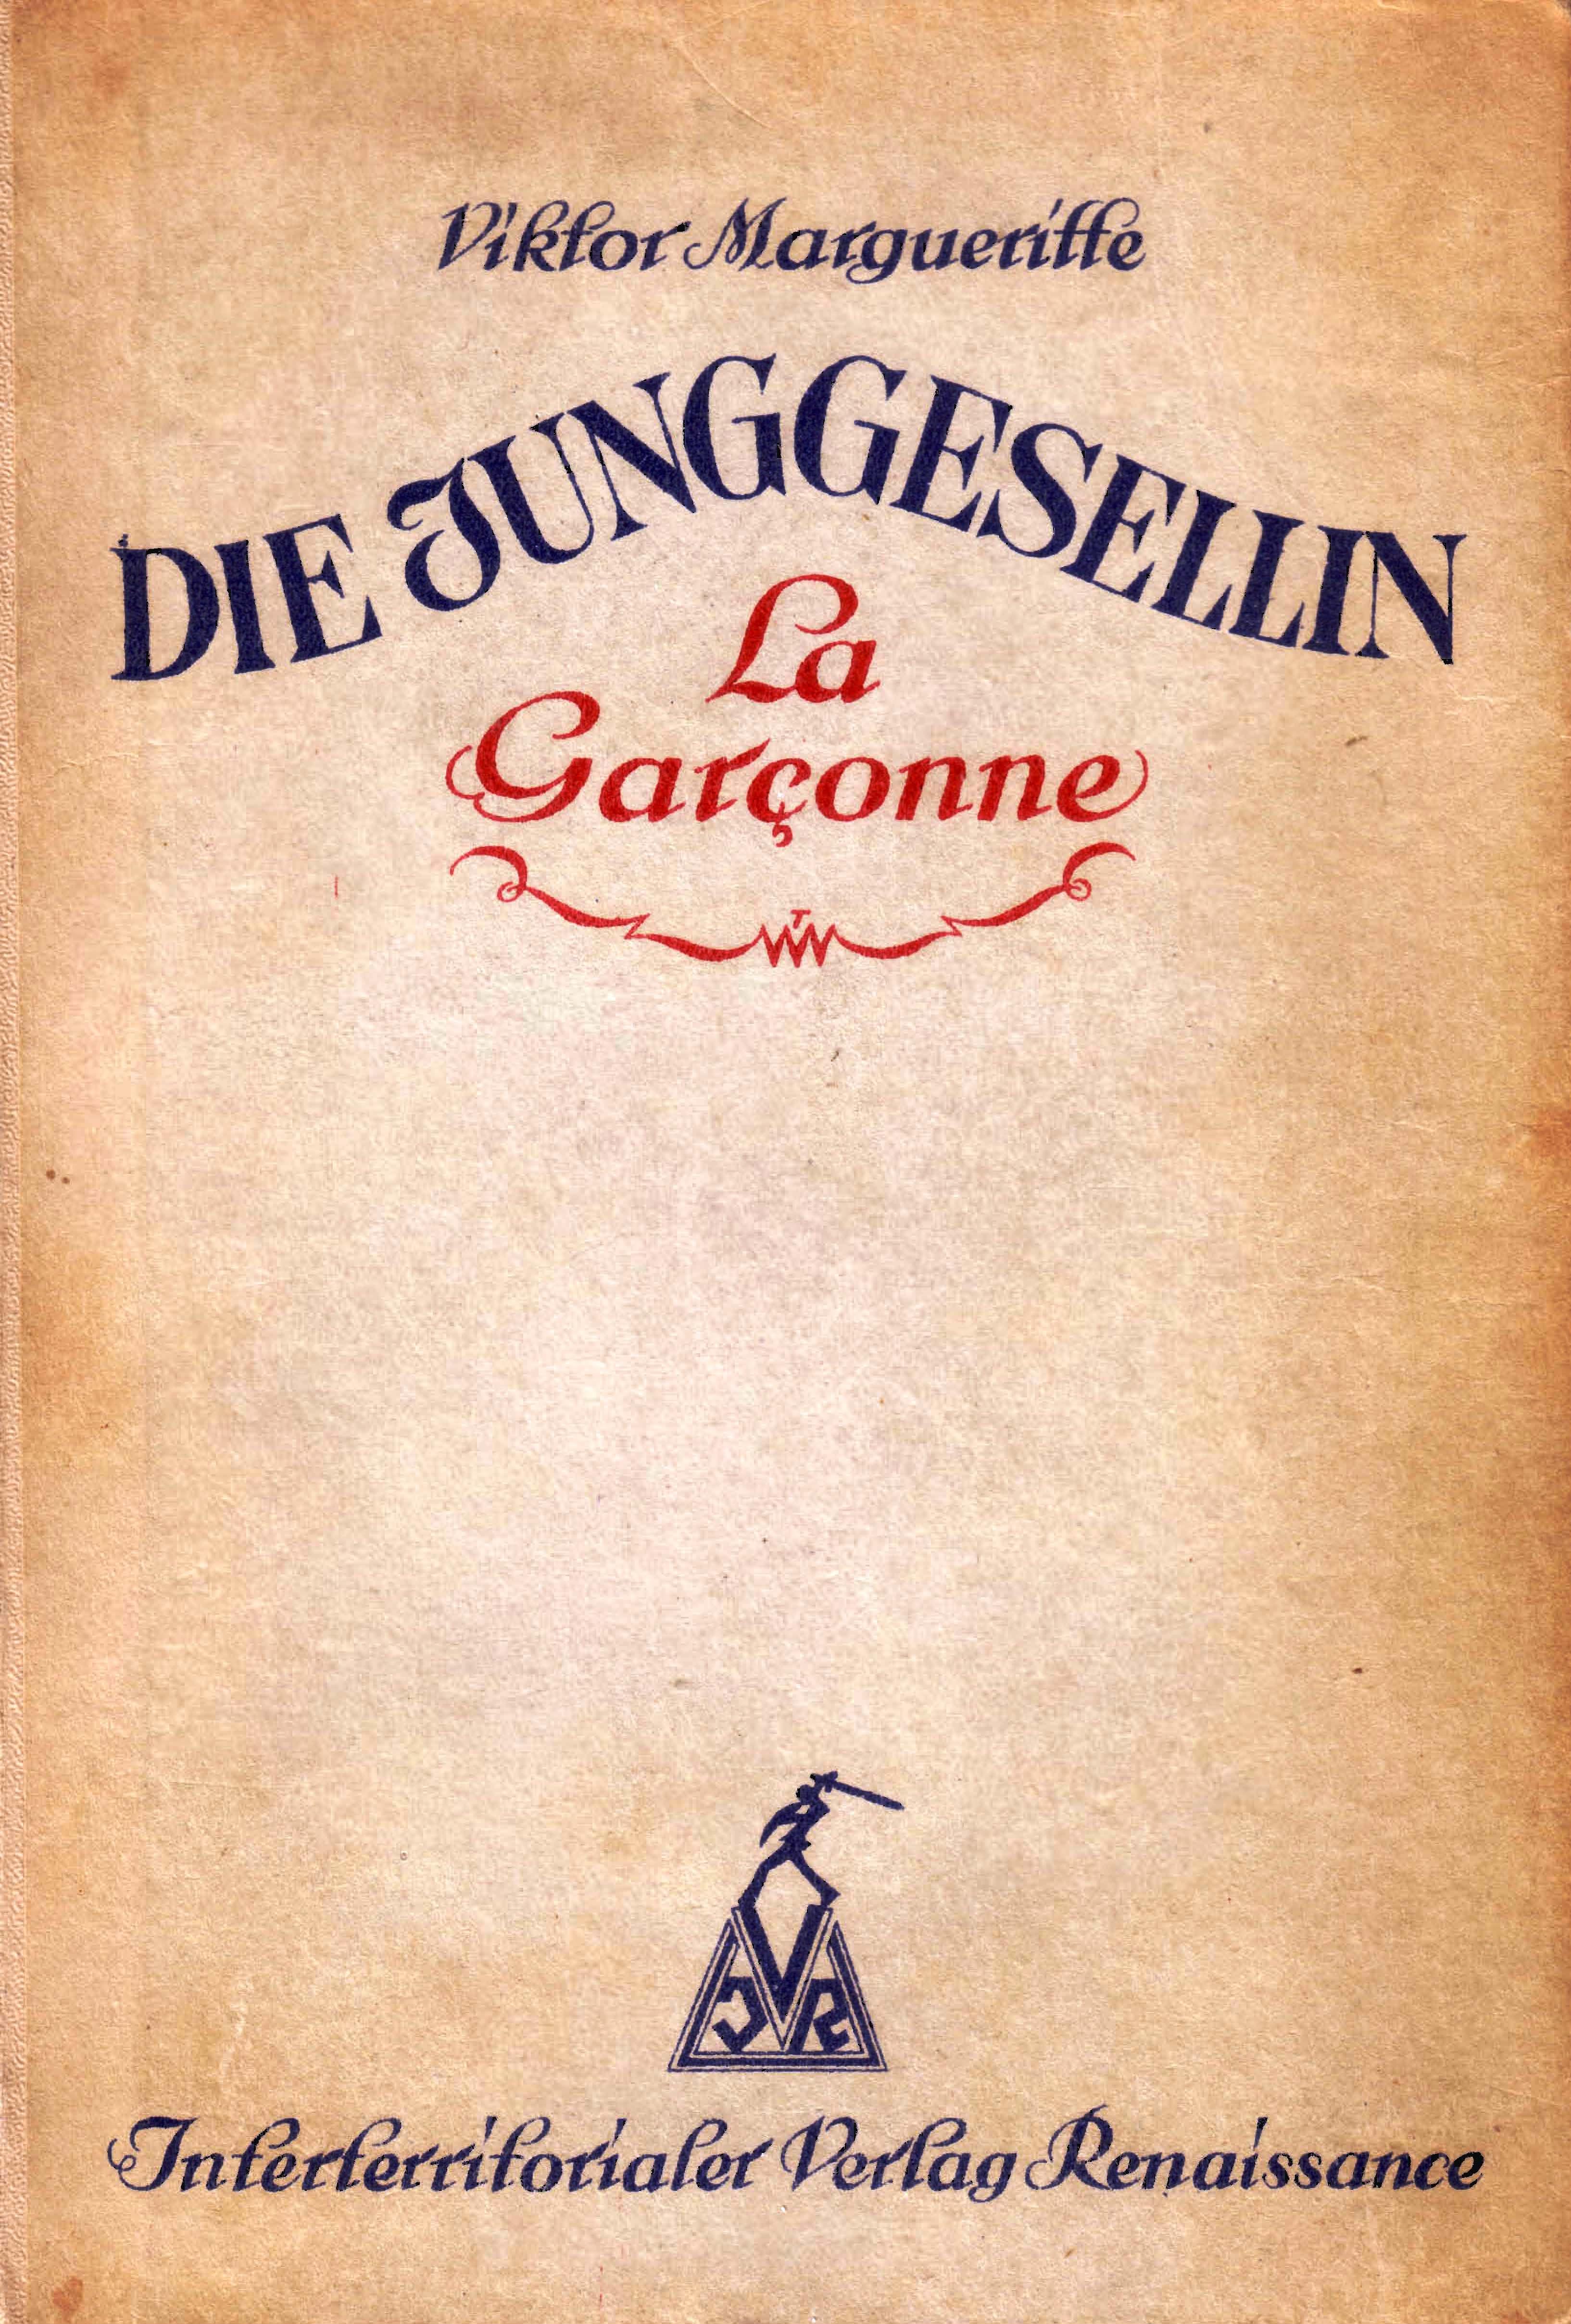 Garconne_Renaissance_Verlag